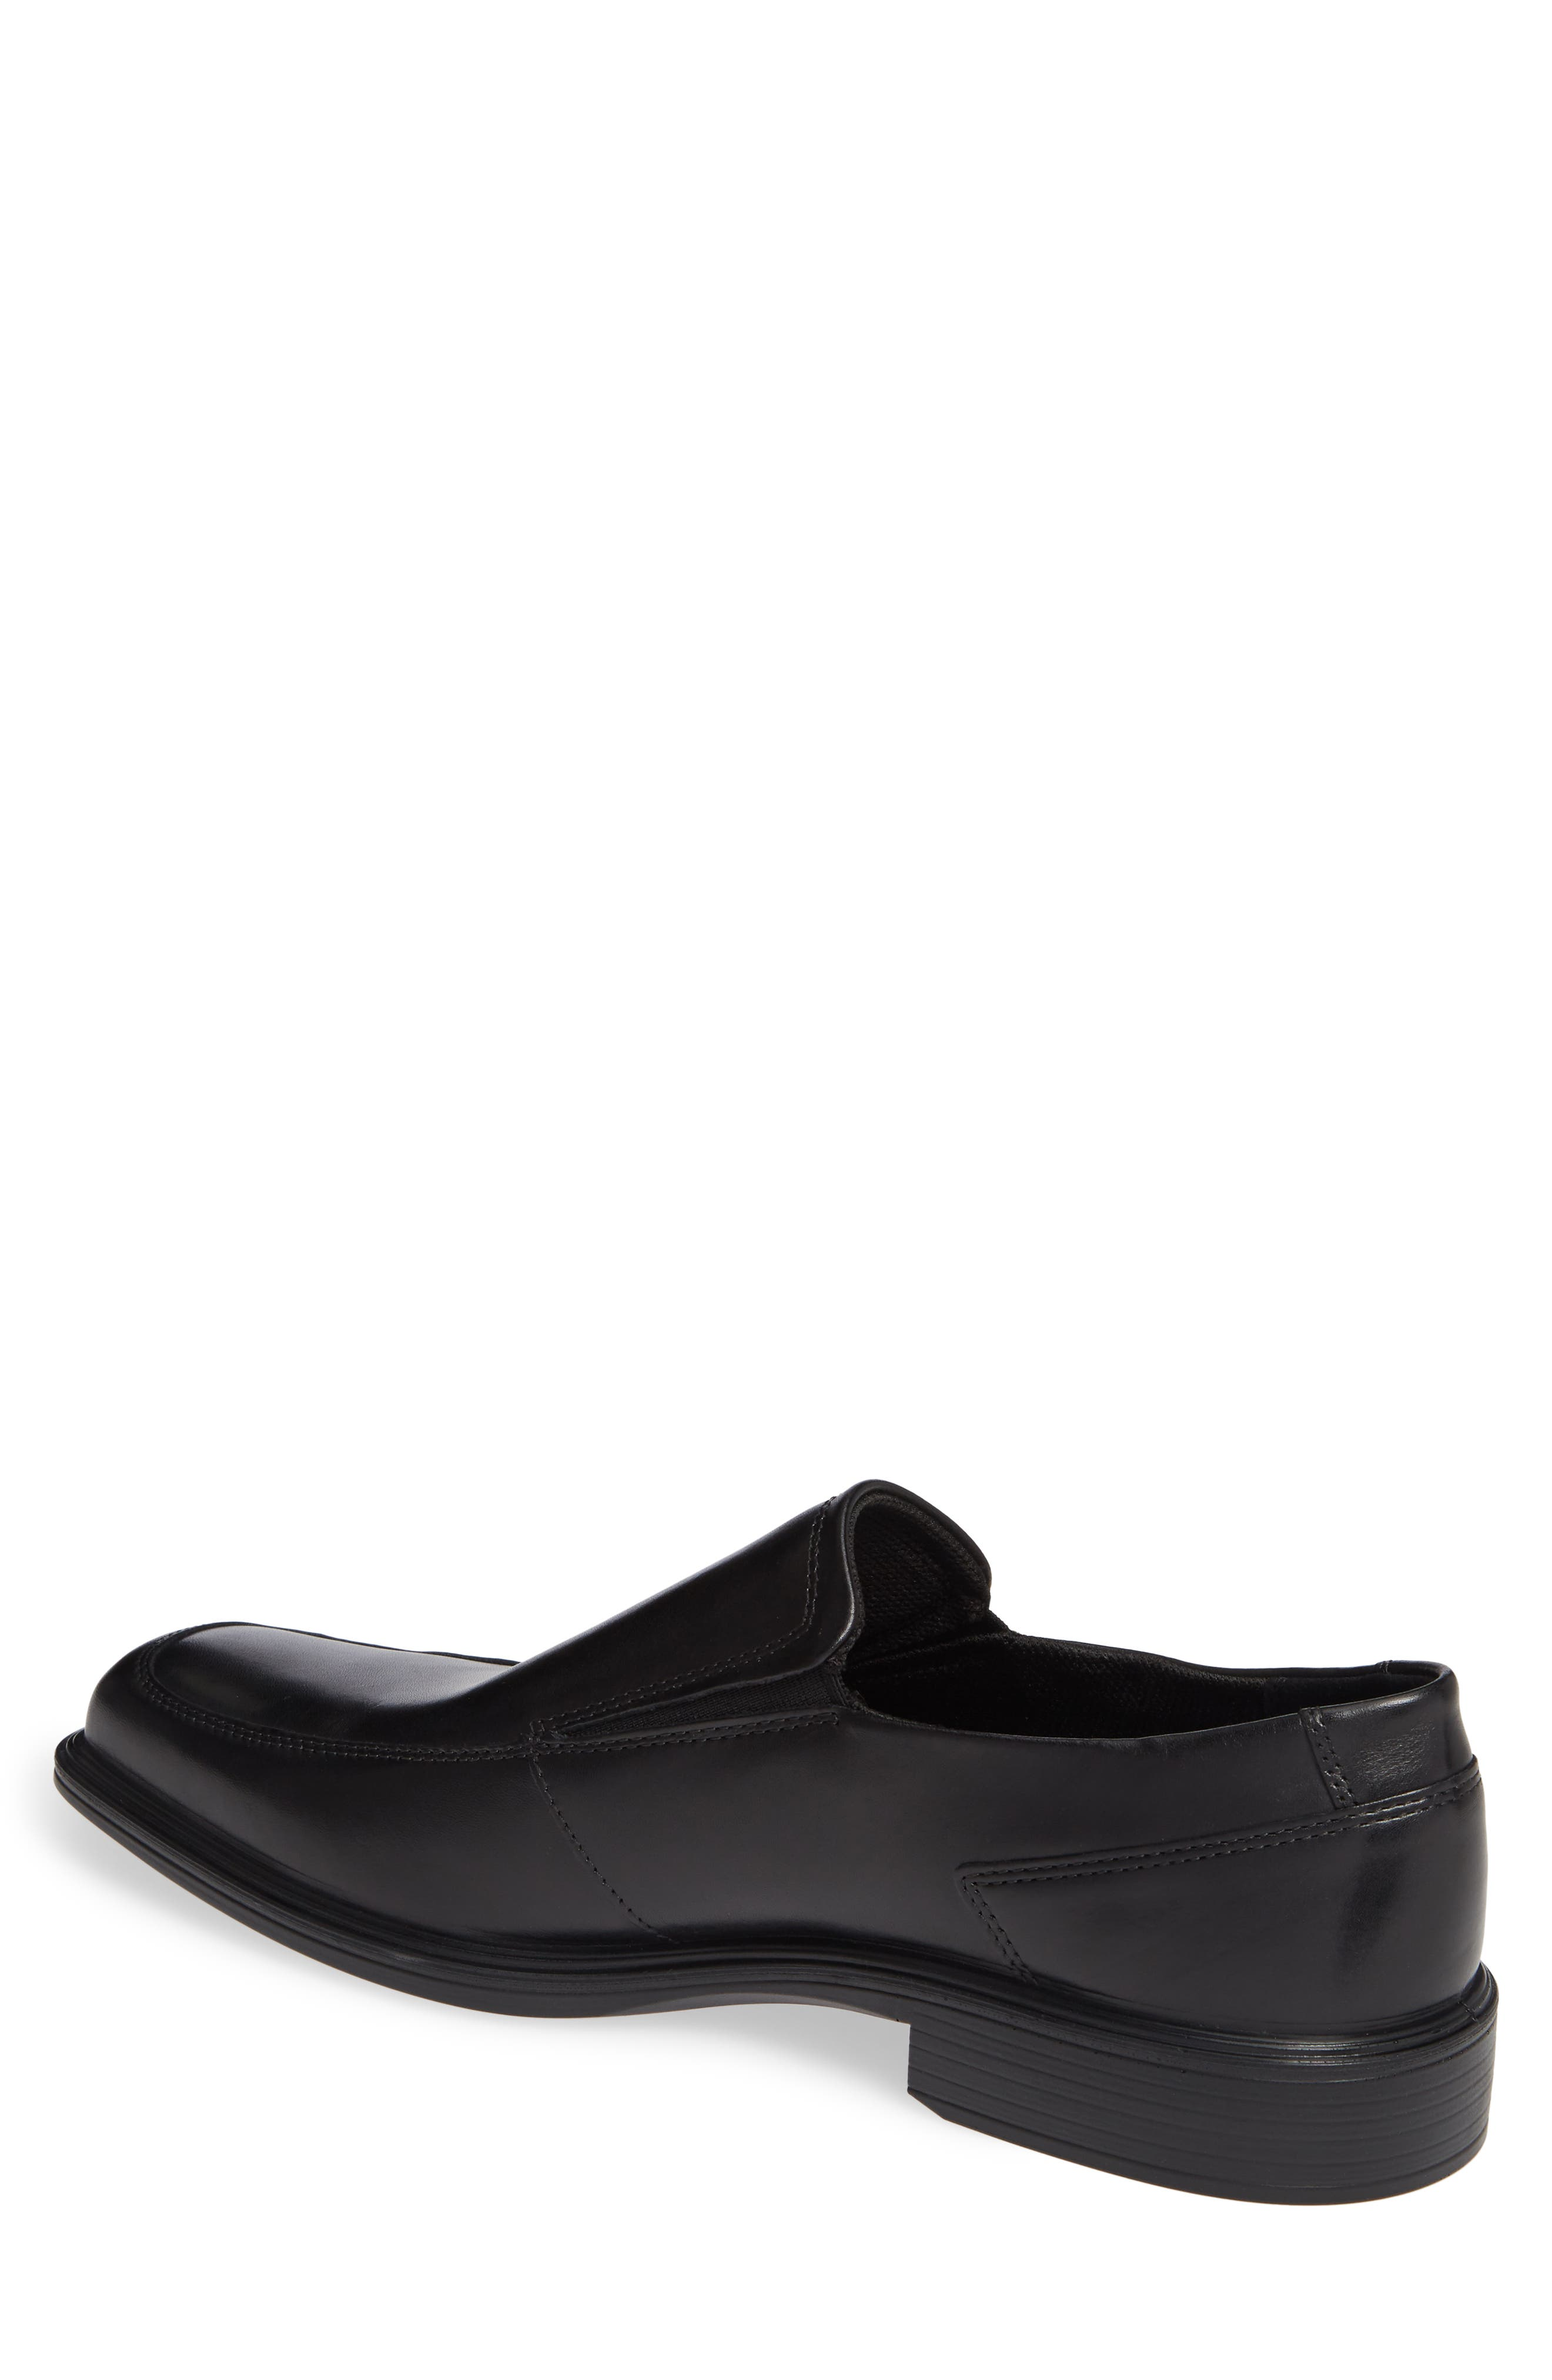 ECCO, Minneapolis Venetian Loafer, Alternate thumbnail 2, color, BLACK/BLACK LEATHER